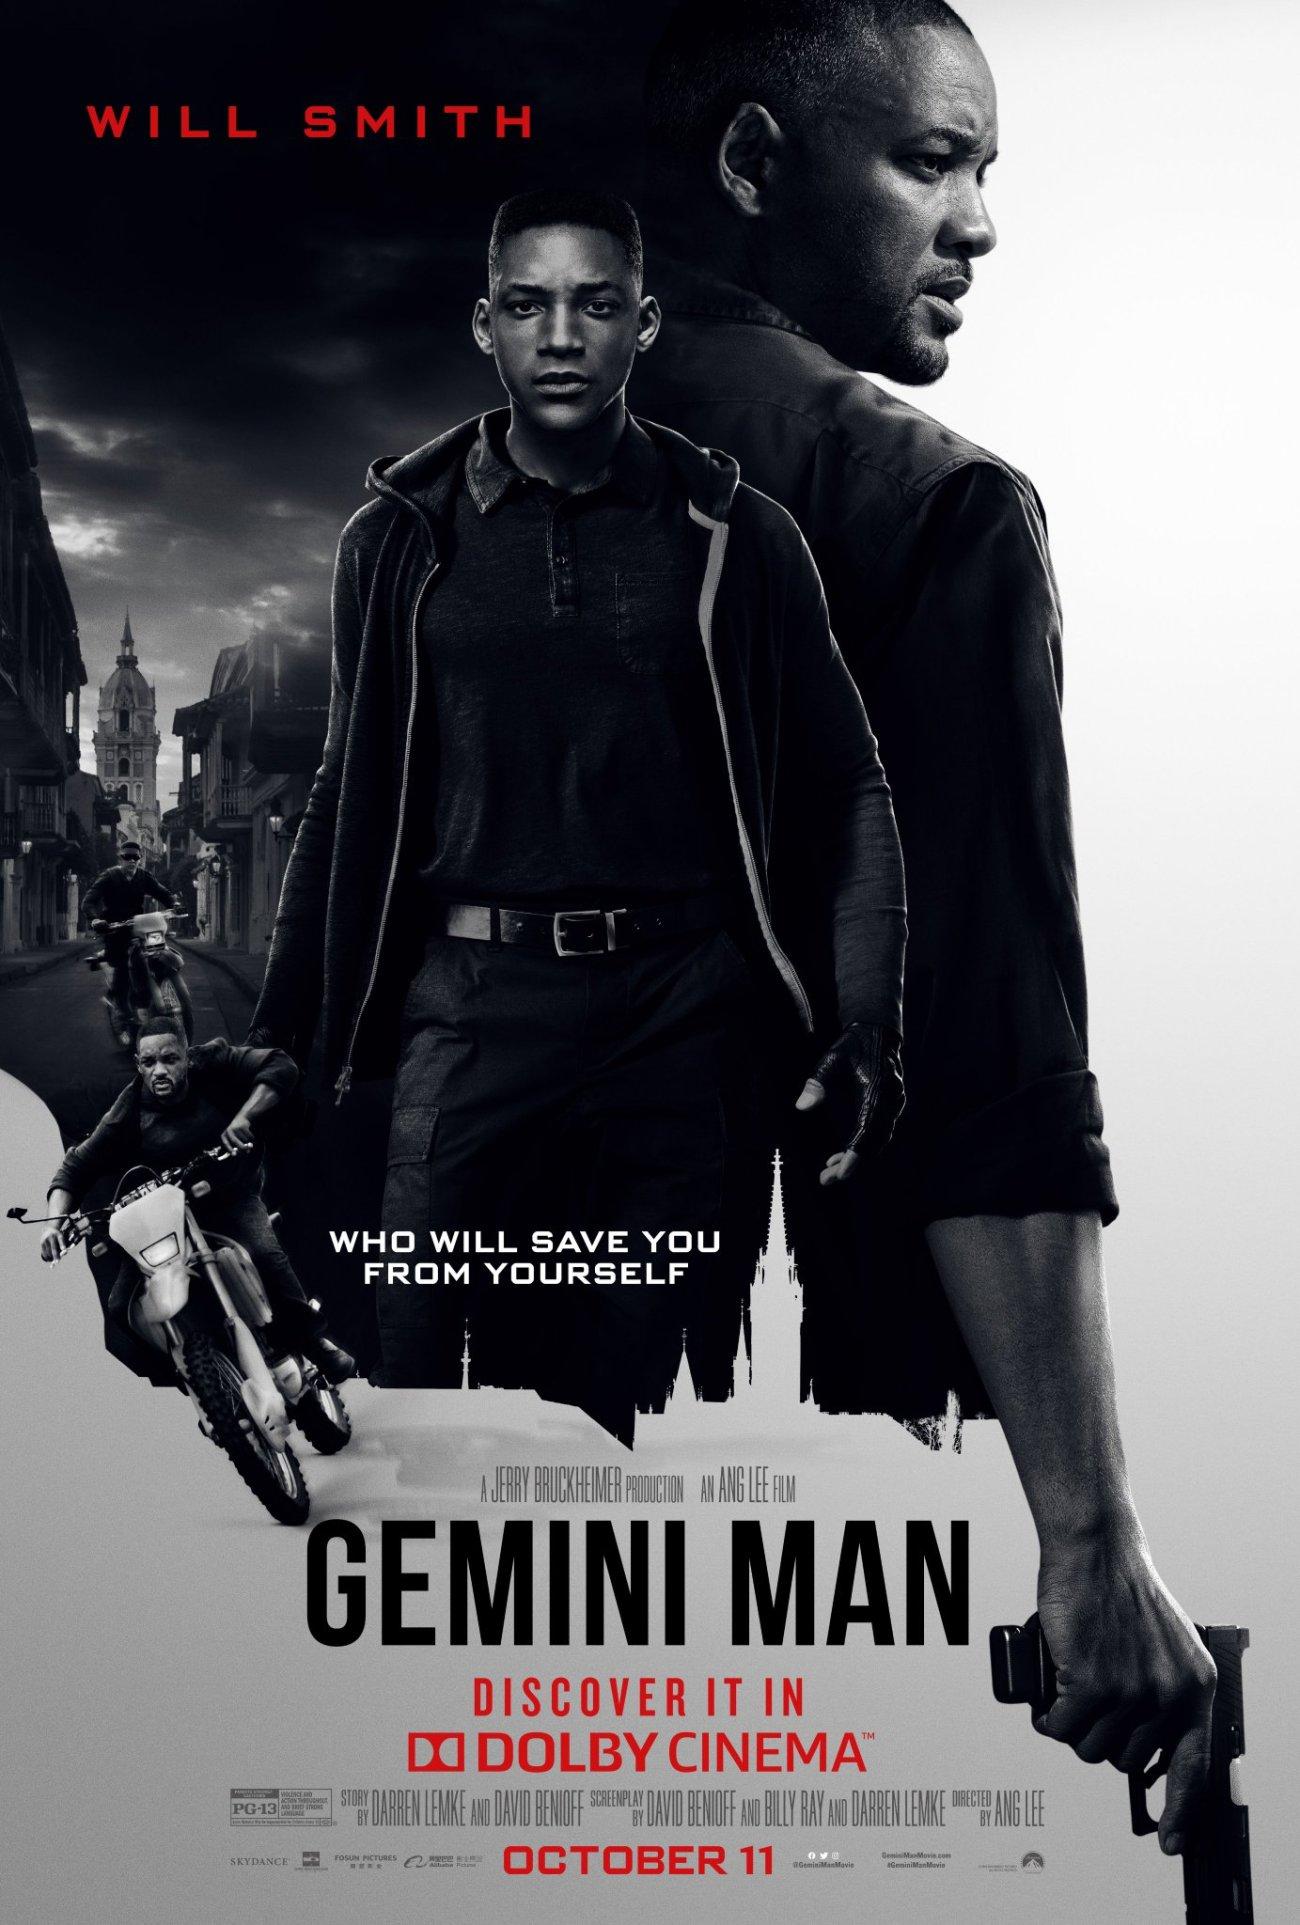 Póster Dolby Cinema de Gemini Man (2019). Imagen: Dolby Cinema Twitter (@DolbyCinema).